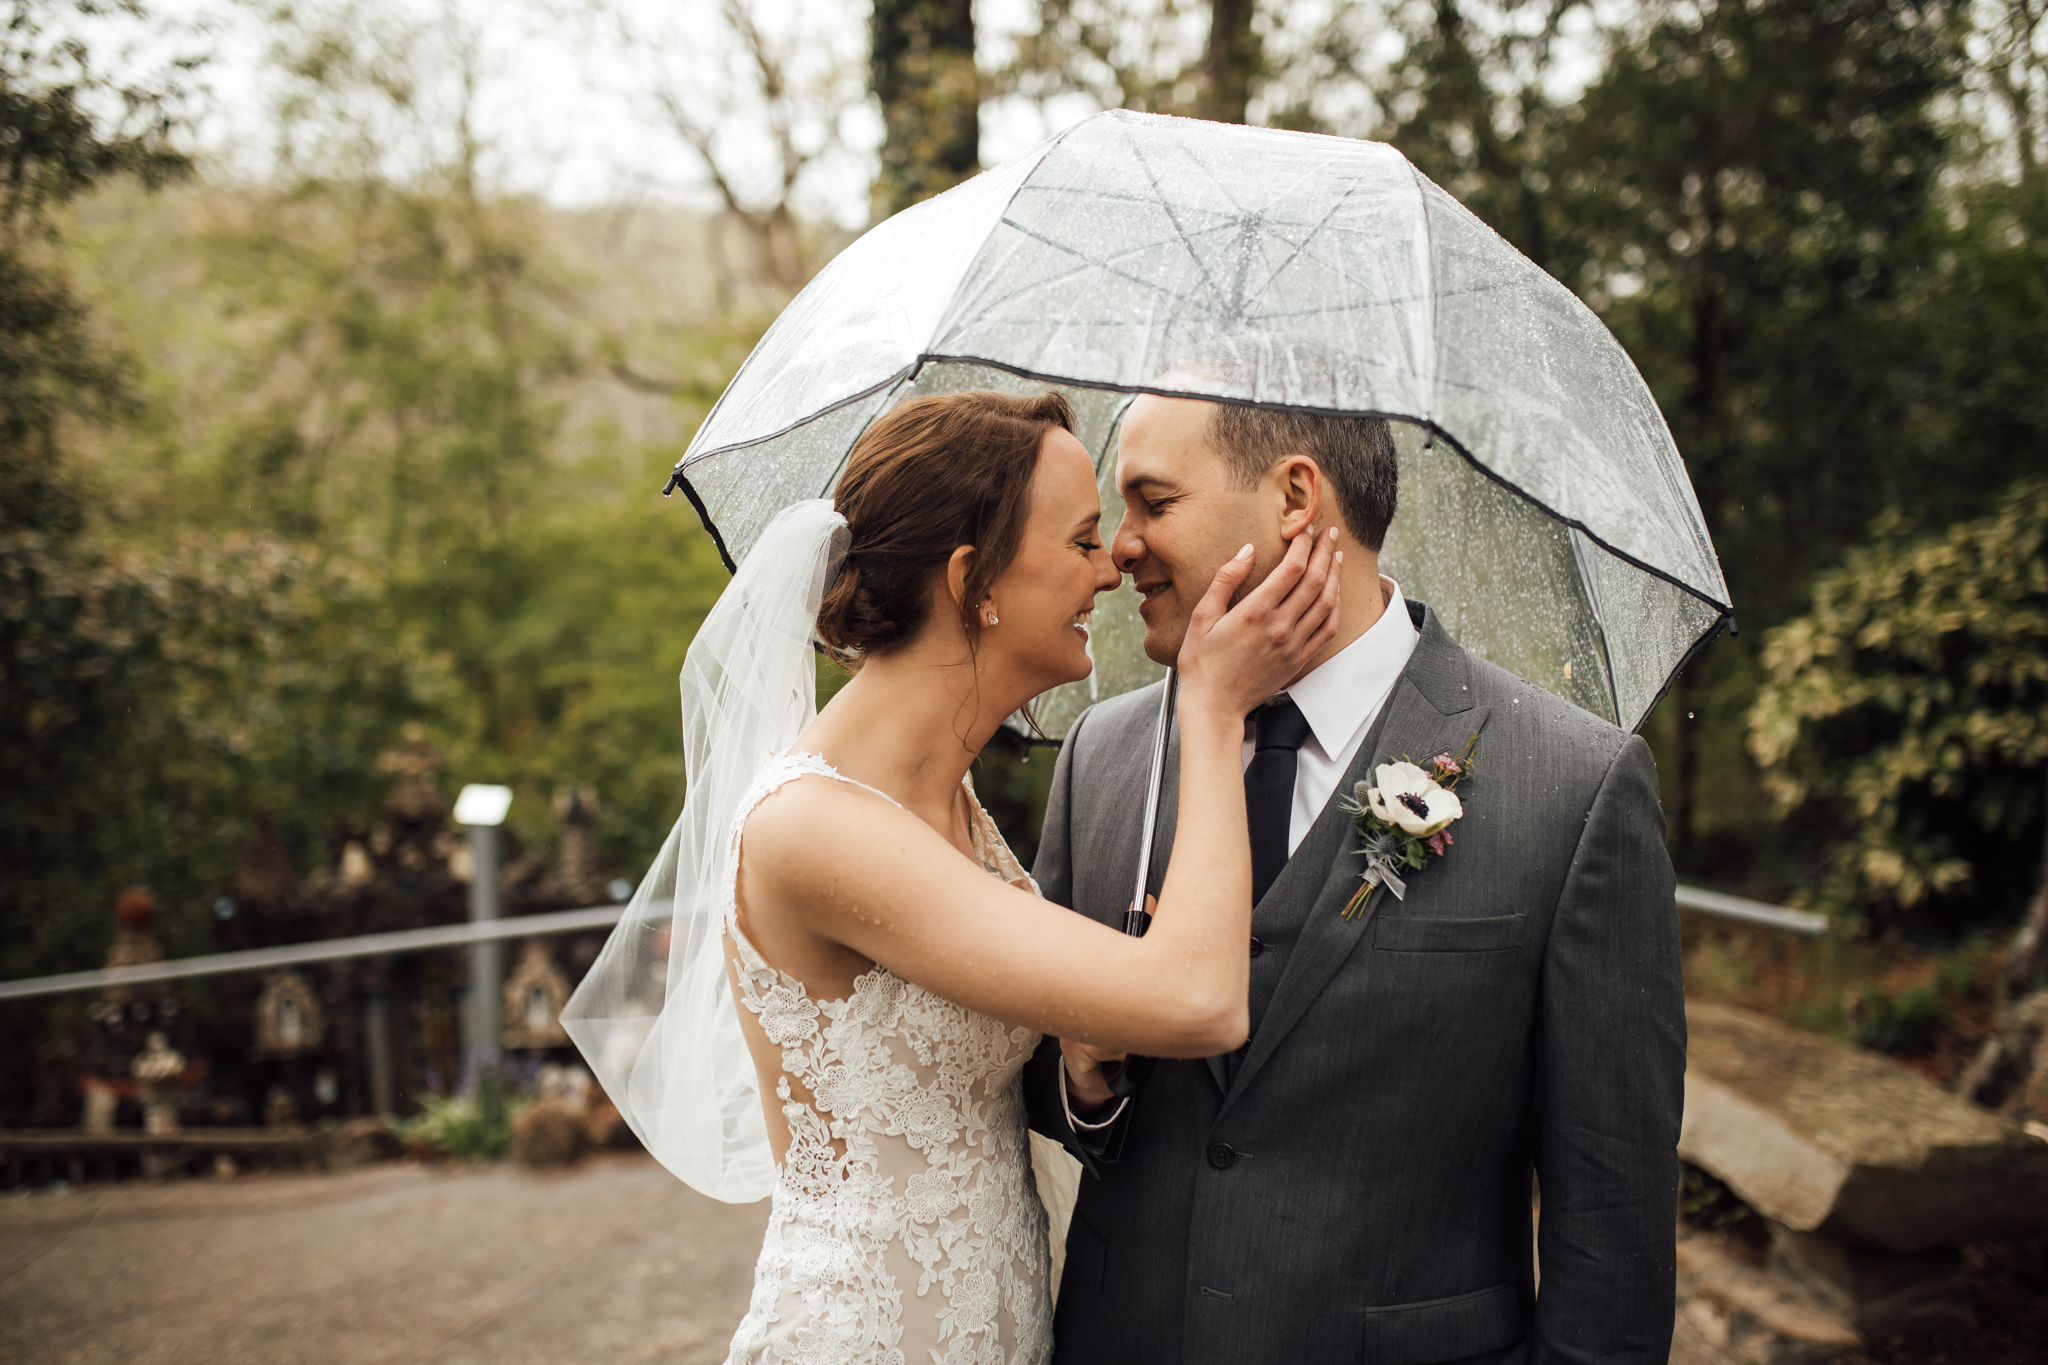 birmingham-alabama-wedding-photographer-laura-terry-the-warmth-around-you (64 of 110).jpg